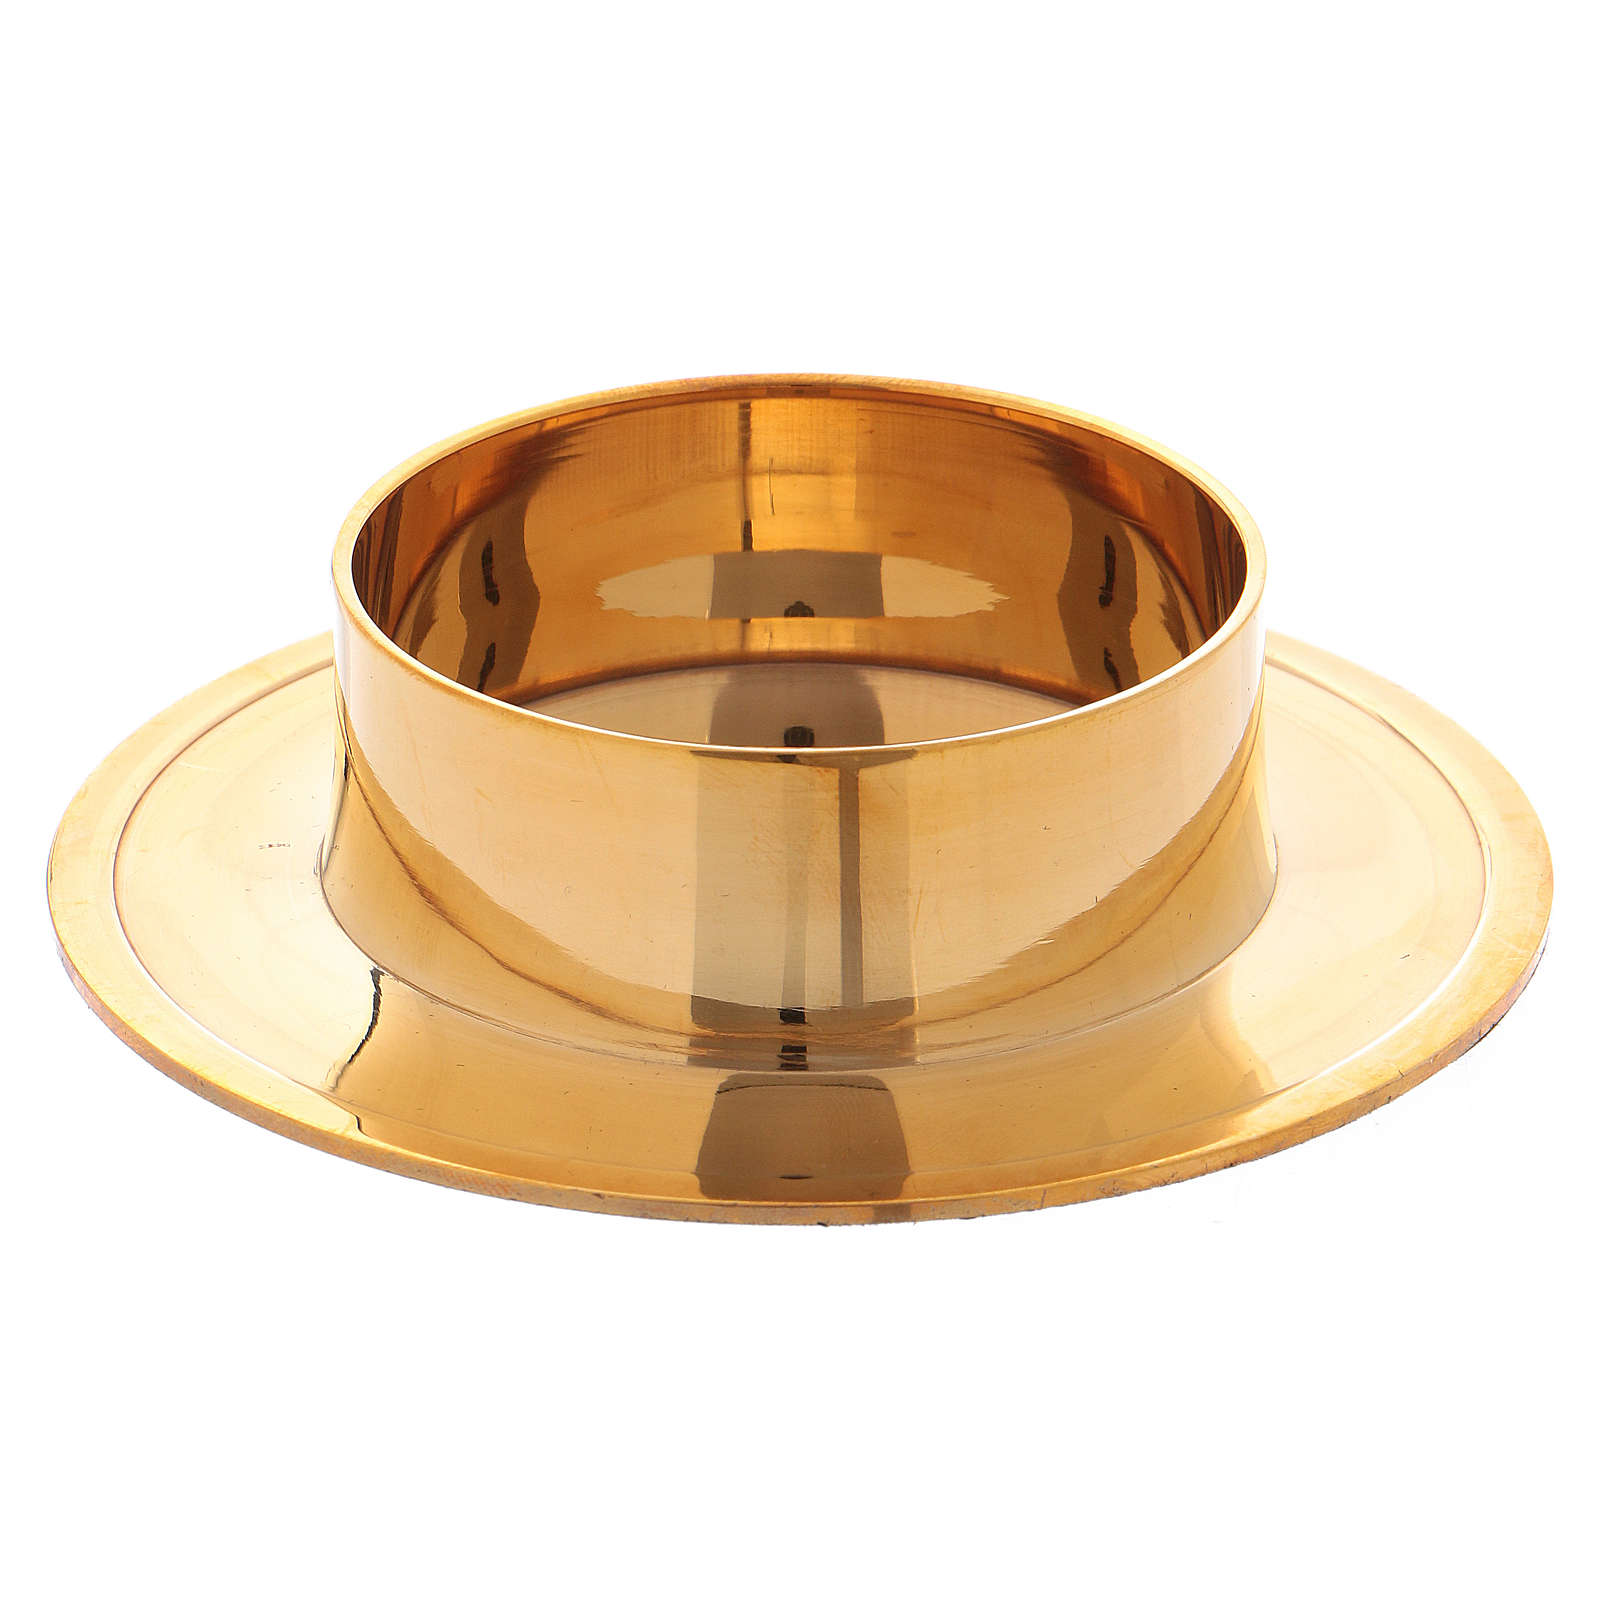 Portacandela tondo in ottone dorato lucido 6 cm 4